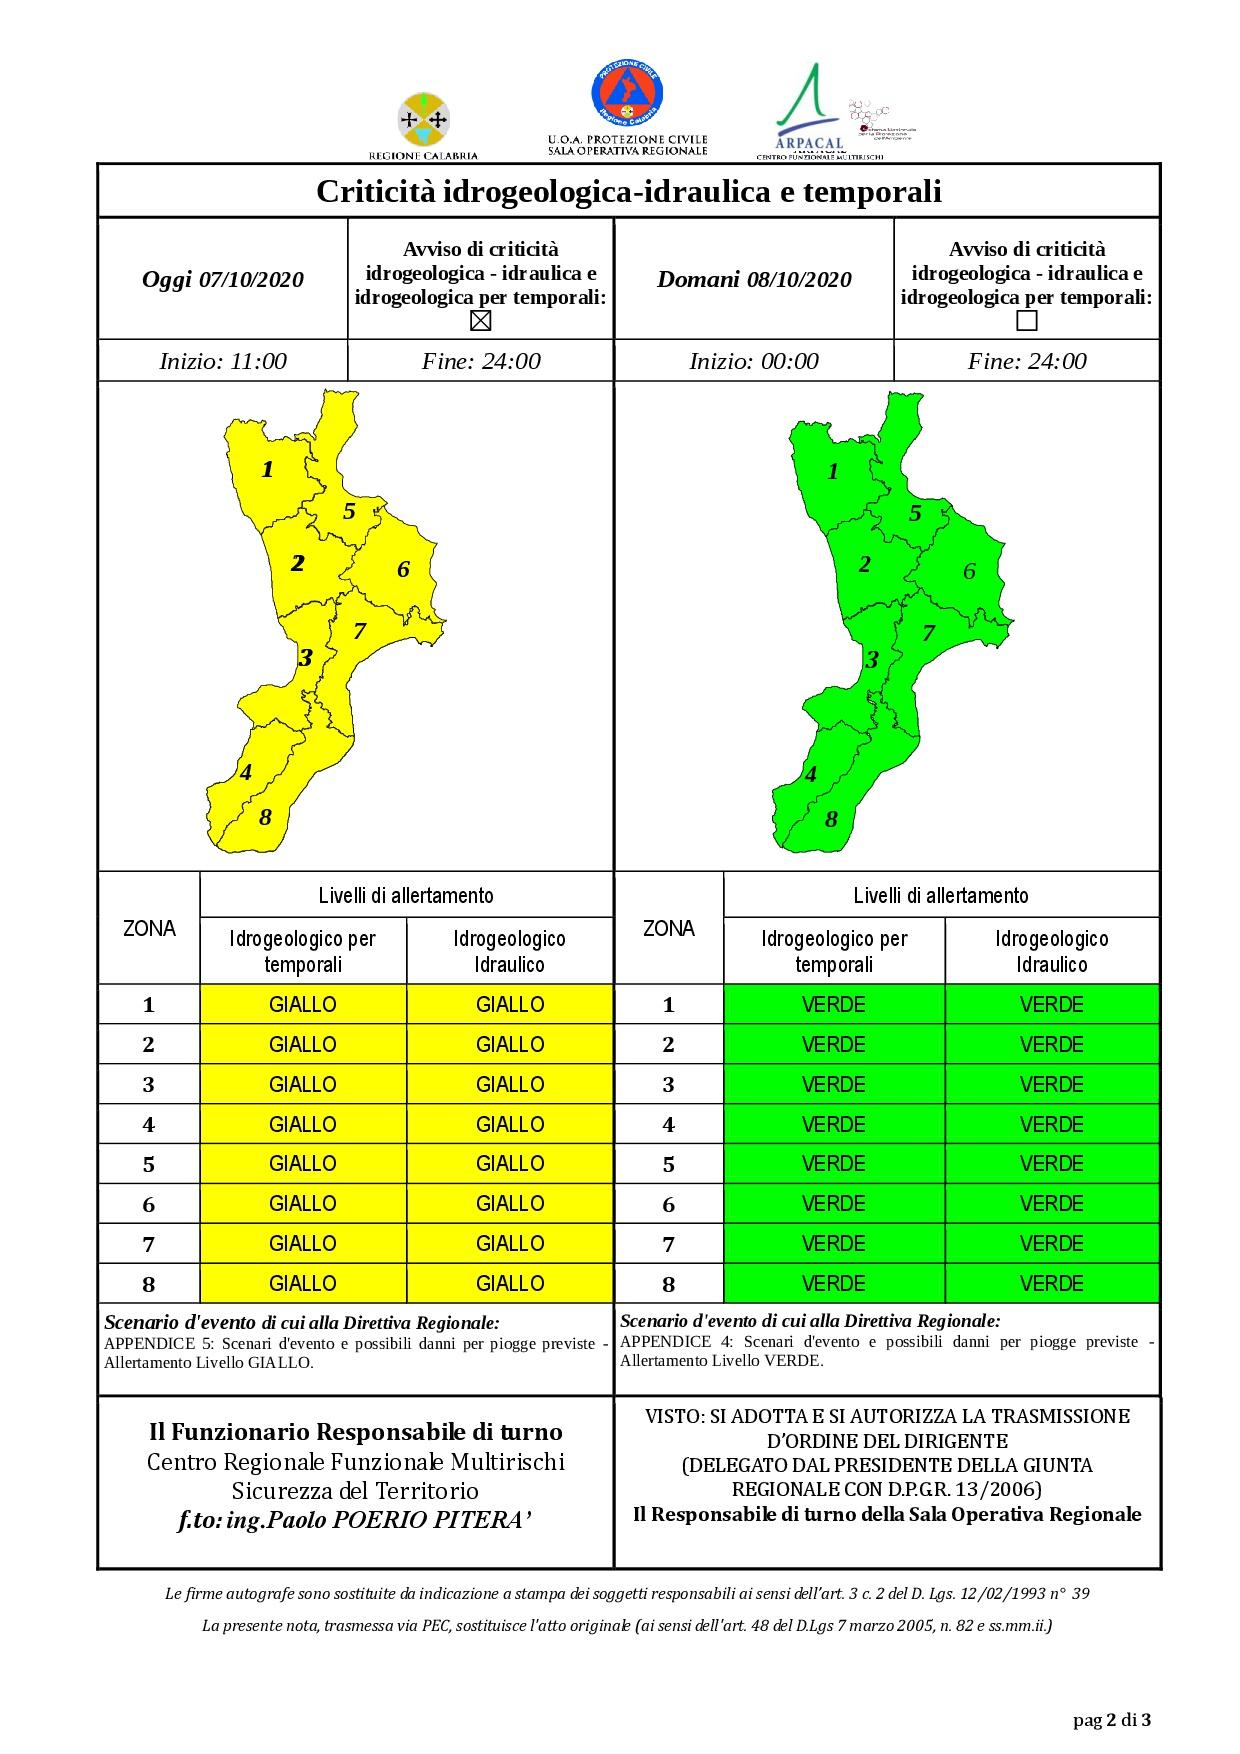 Criticità idrogeologica-idraulica e temporali in Calabria 07-10-2020